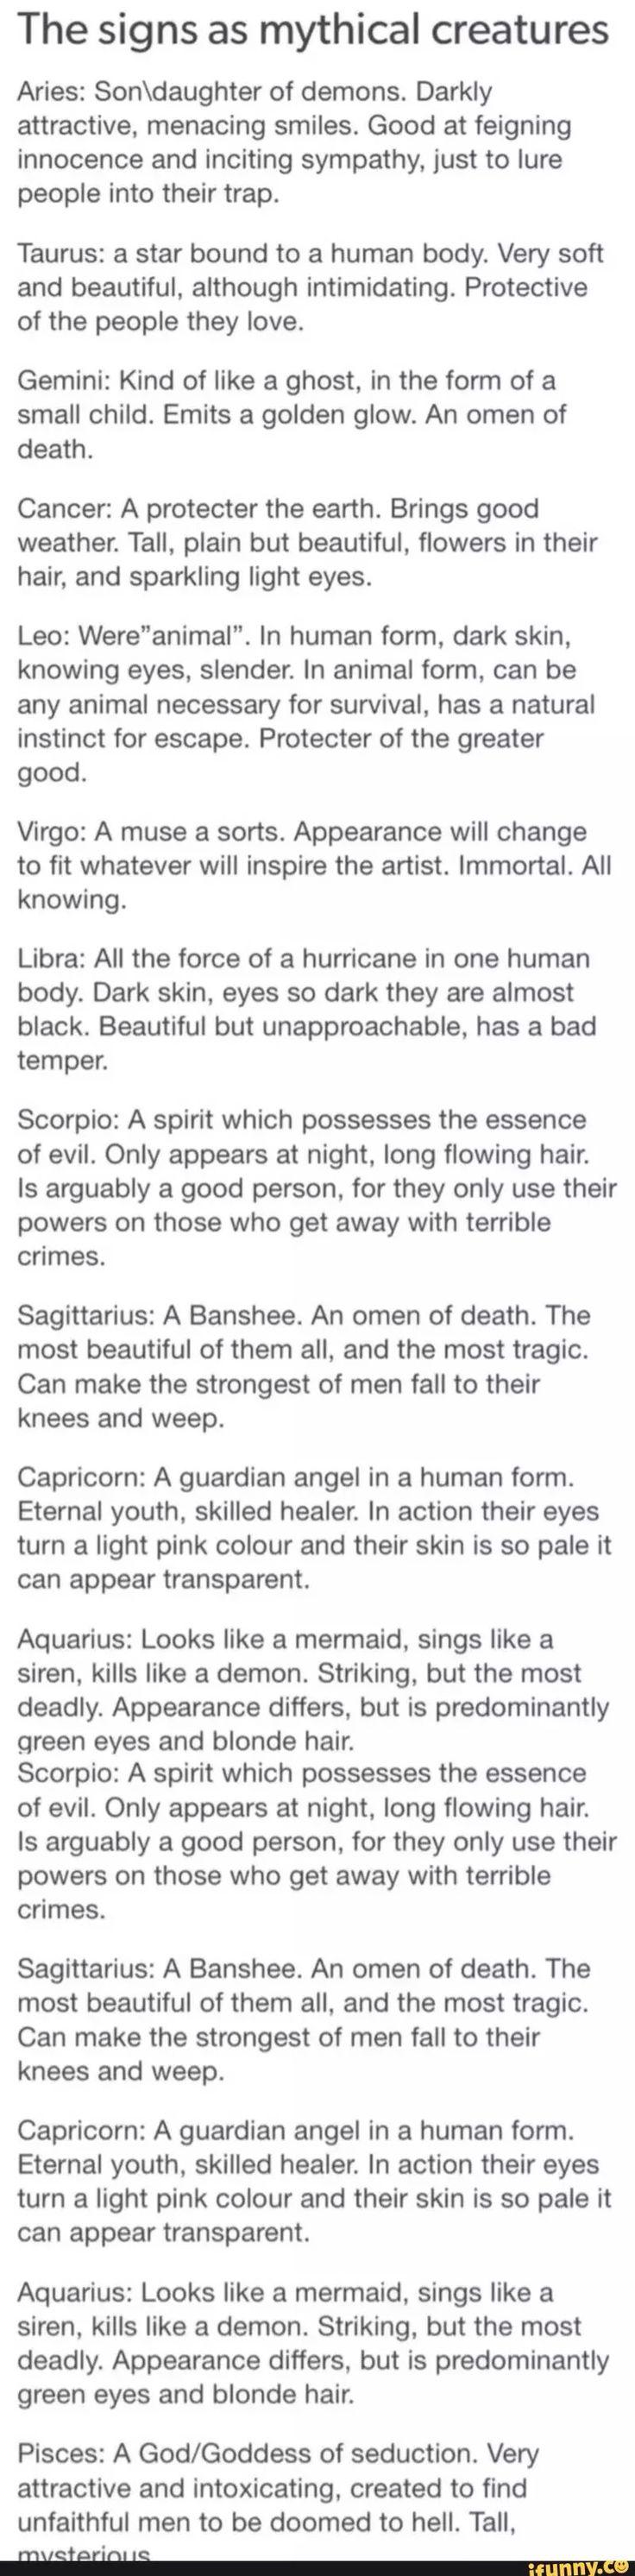 Best 25+ My moon sign ideas on Pinterest | Moon sign horoscope ...